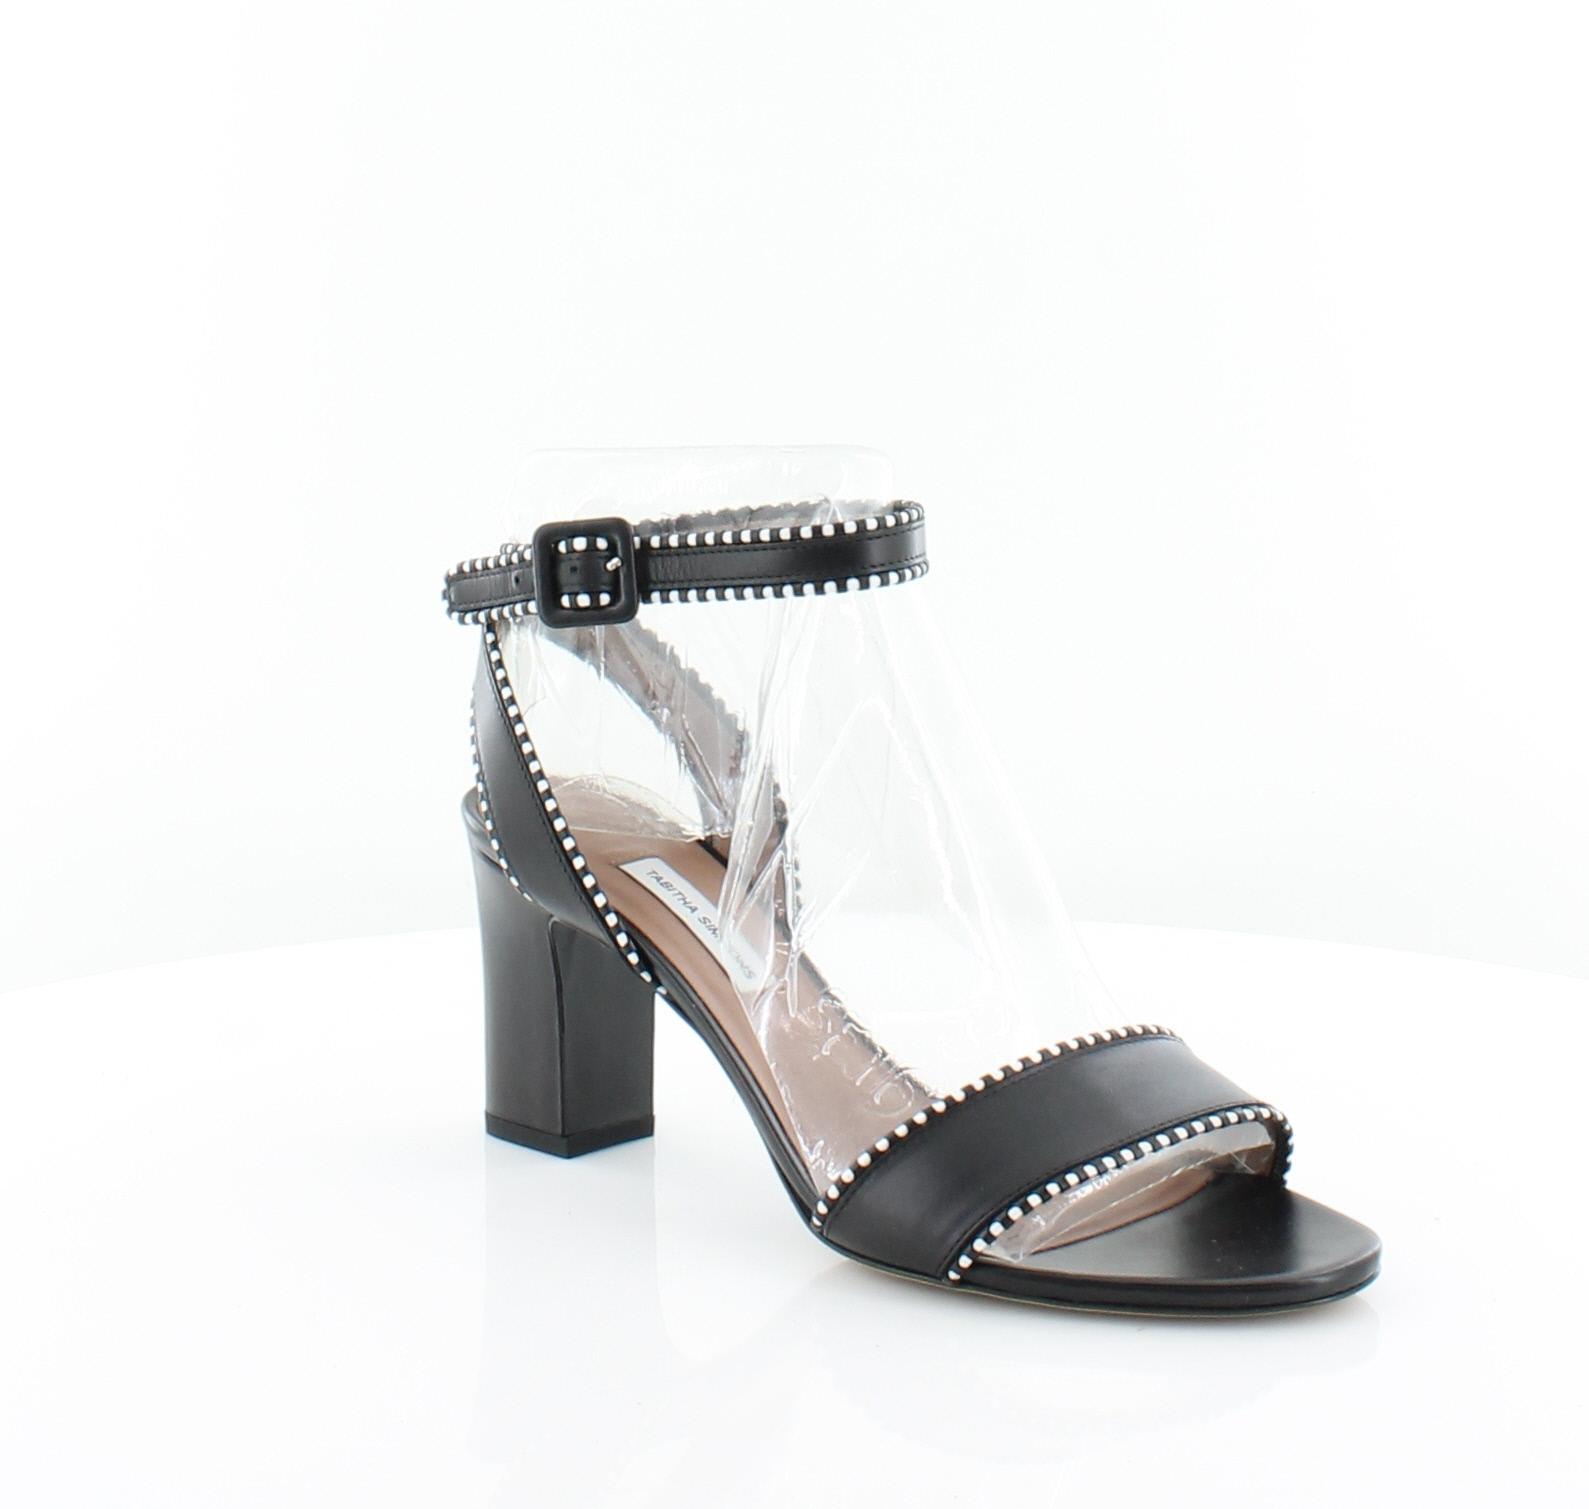 df37179ba6 Tabitha Simmons Leticia Black Womens Shoes Size 9 M Heels MSRP  645 ...